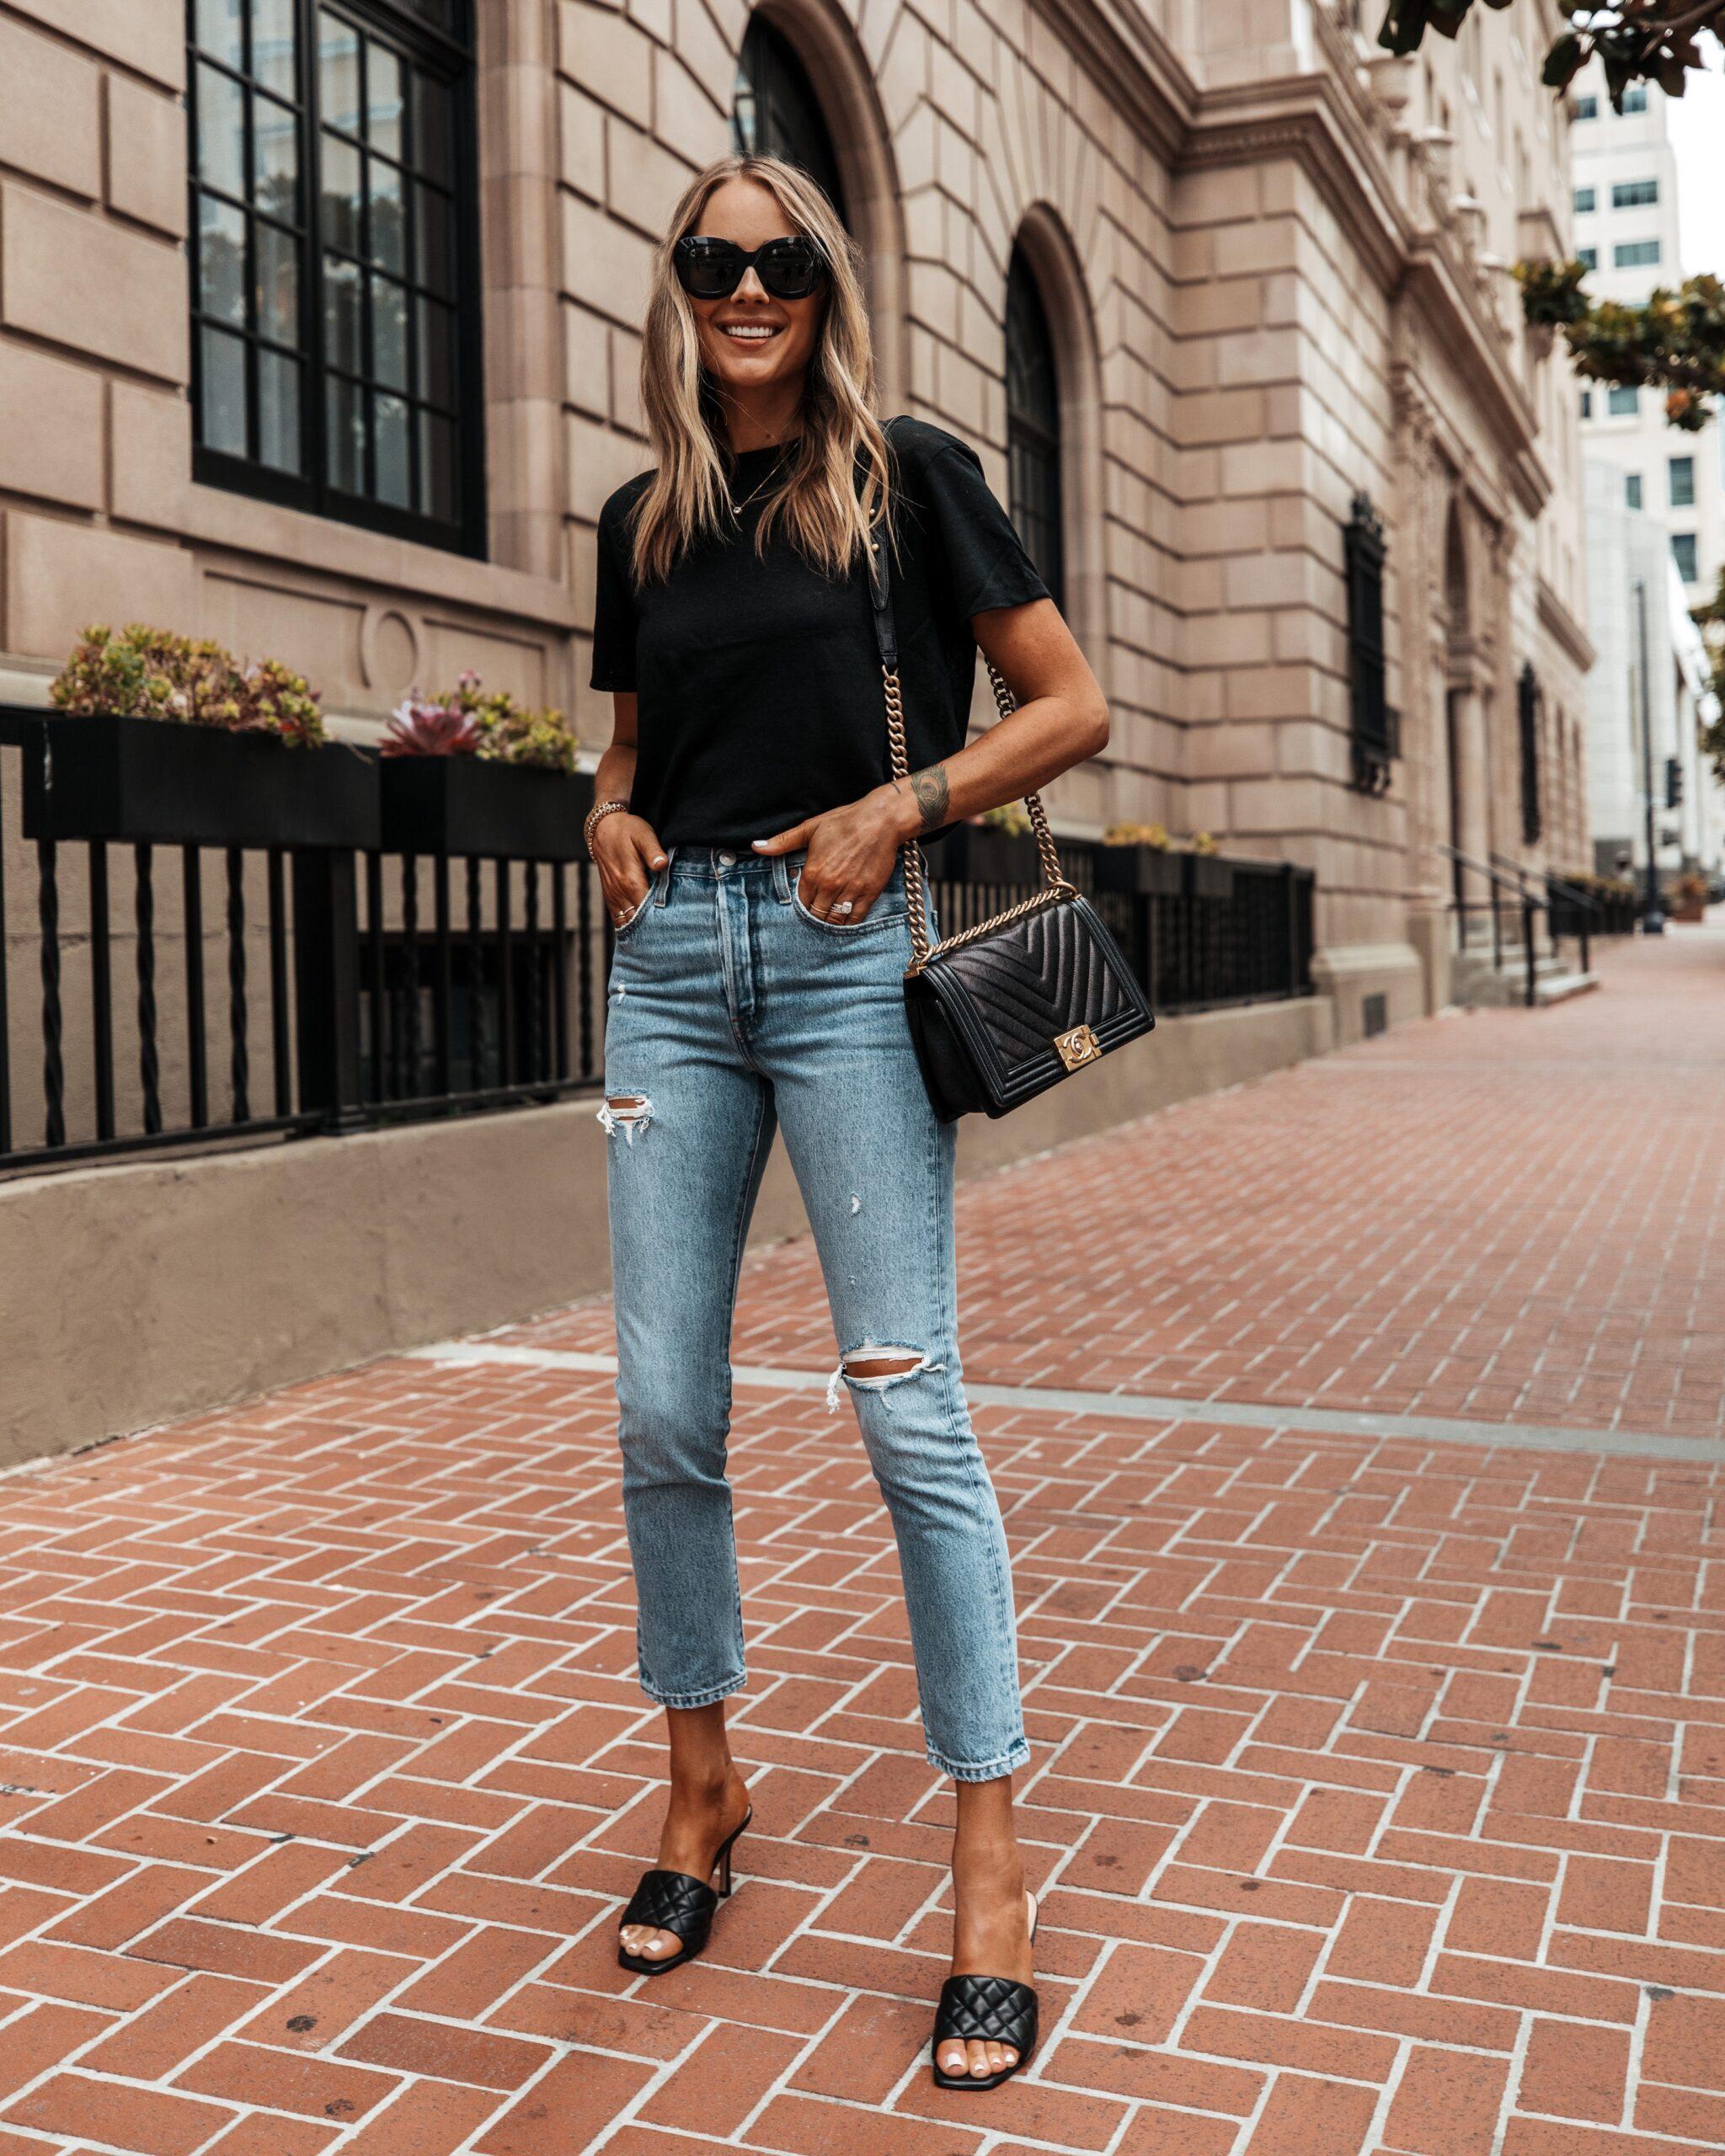 Fashion Jackson Wearing Black Tshirt Levis 501 Ripped Skinny Jeans Black Quilted Sandals Black Chanel Boy Bag